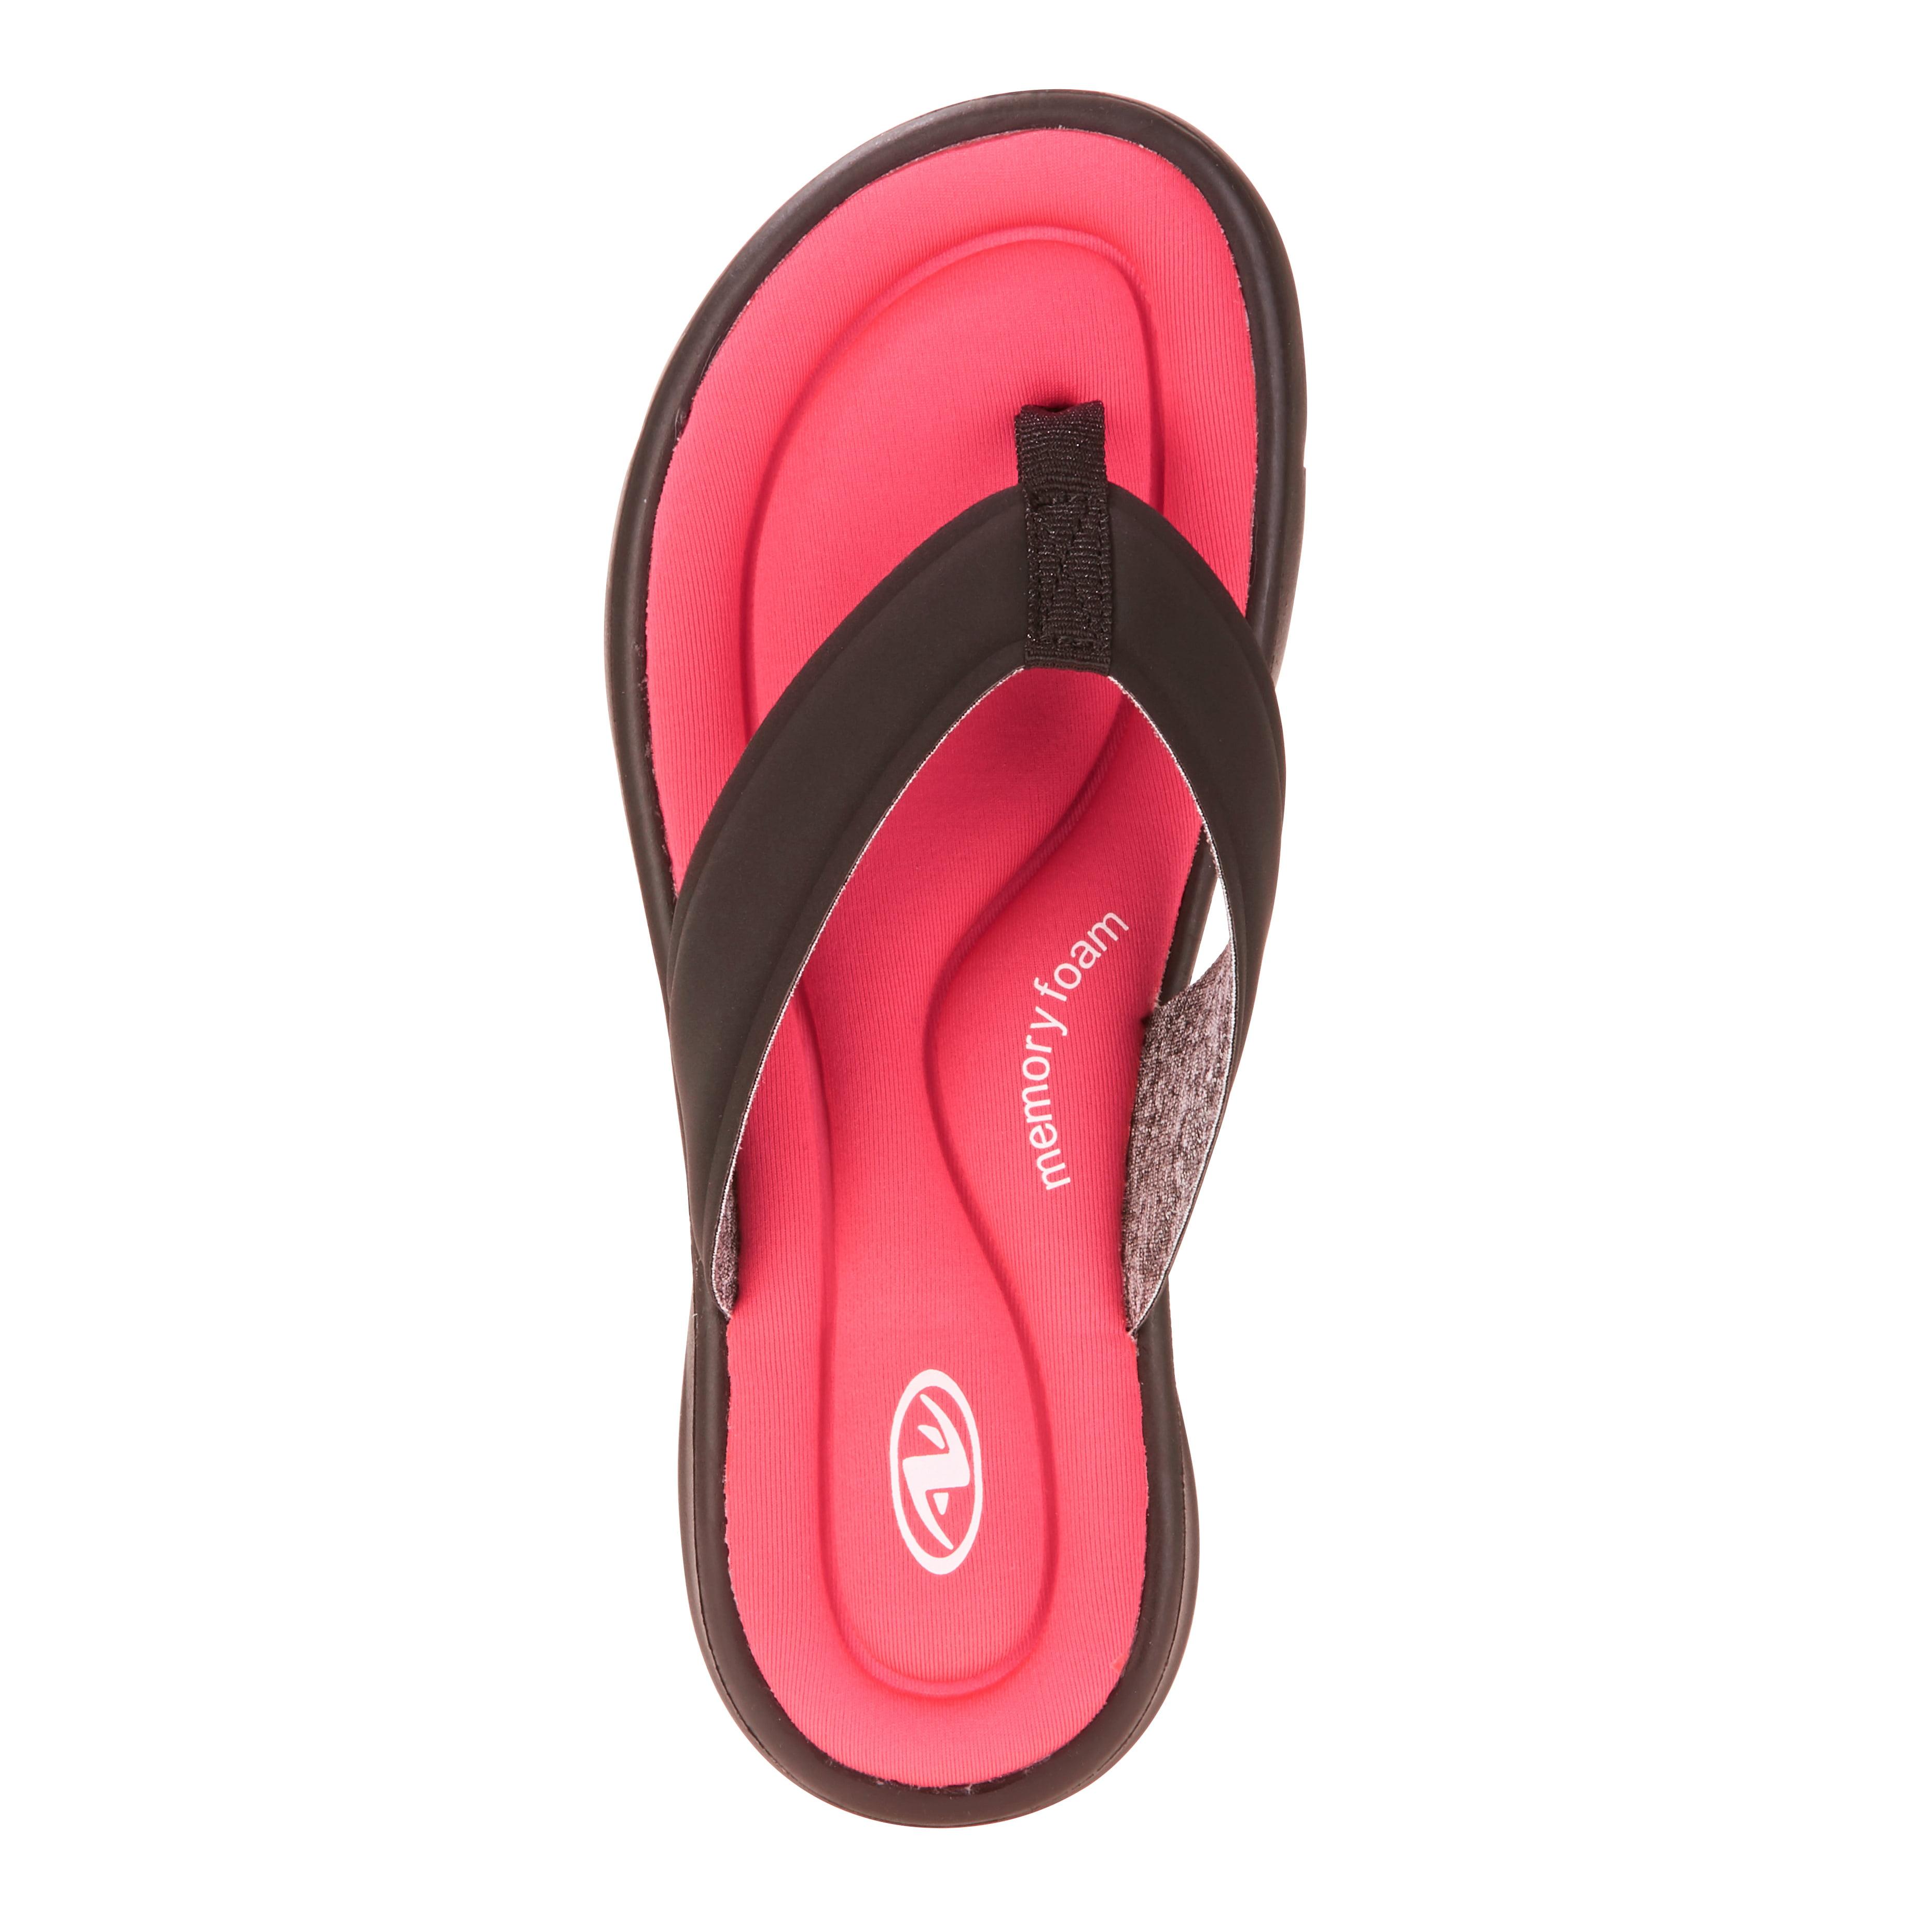 Memory Foam Thong Sandal - Walmart